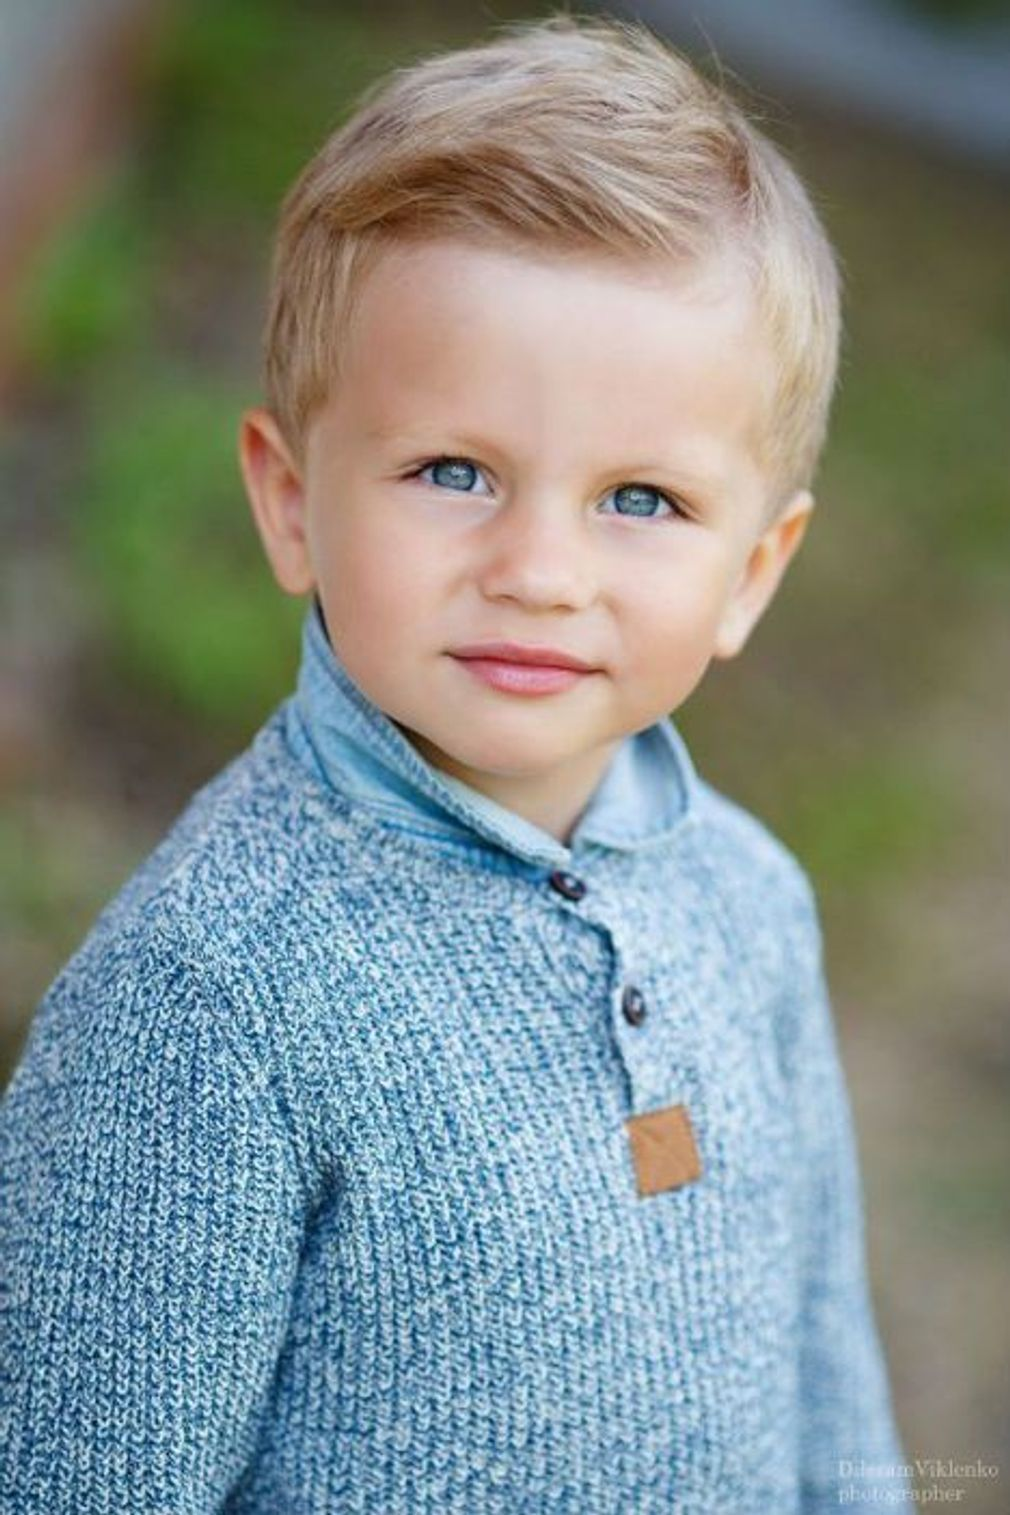 Coupe garçon : coupe garçon brun